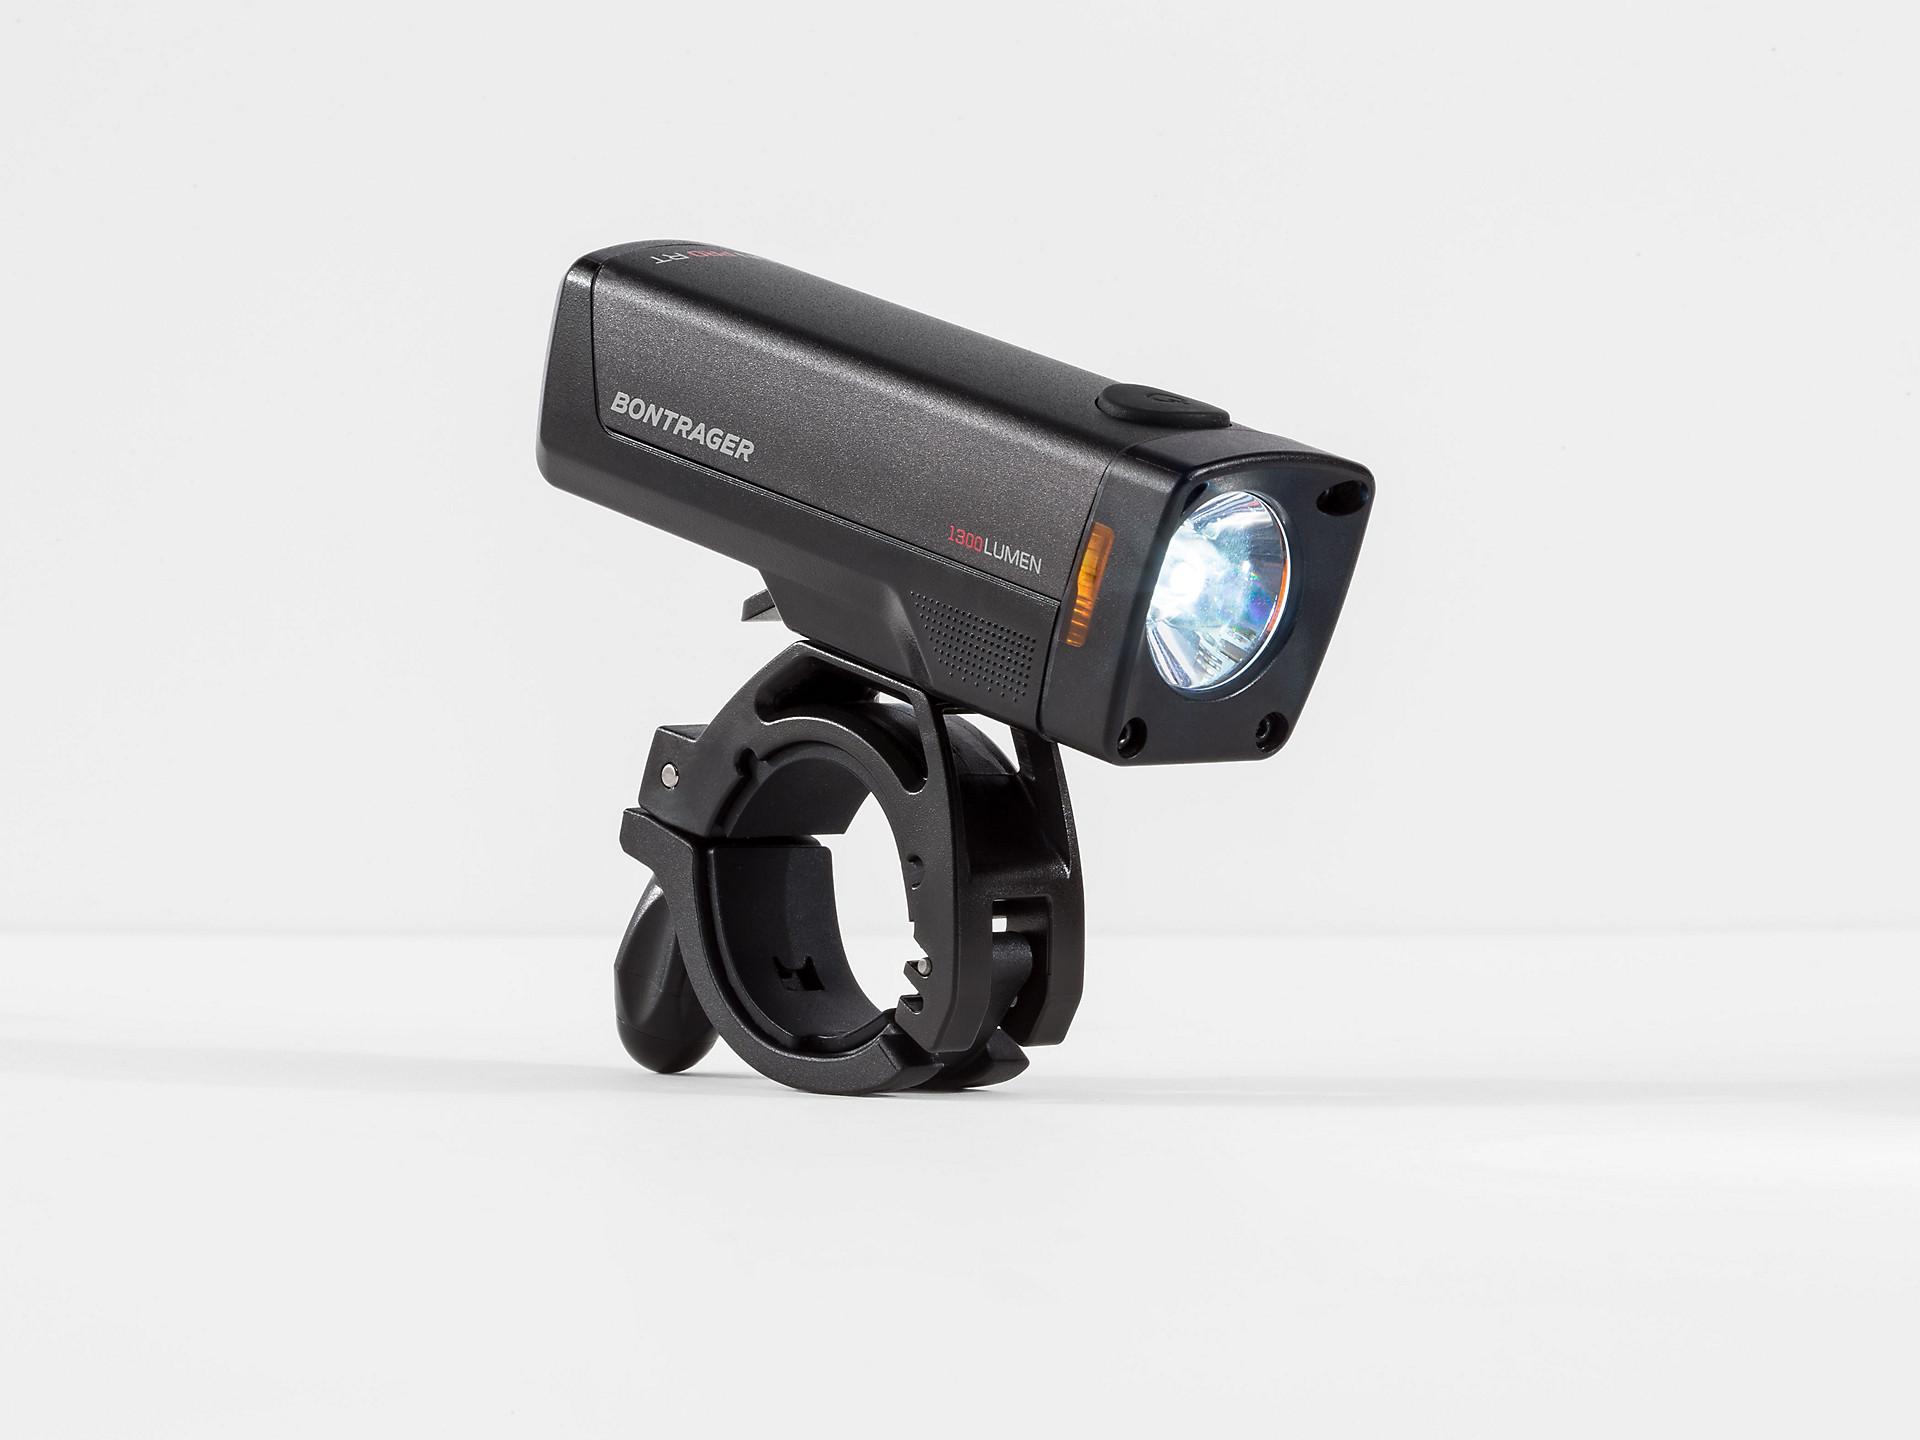 BONTRAGER Ion Pro RT koplamp